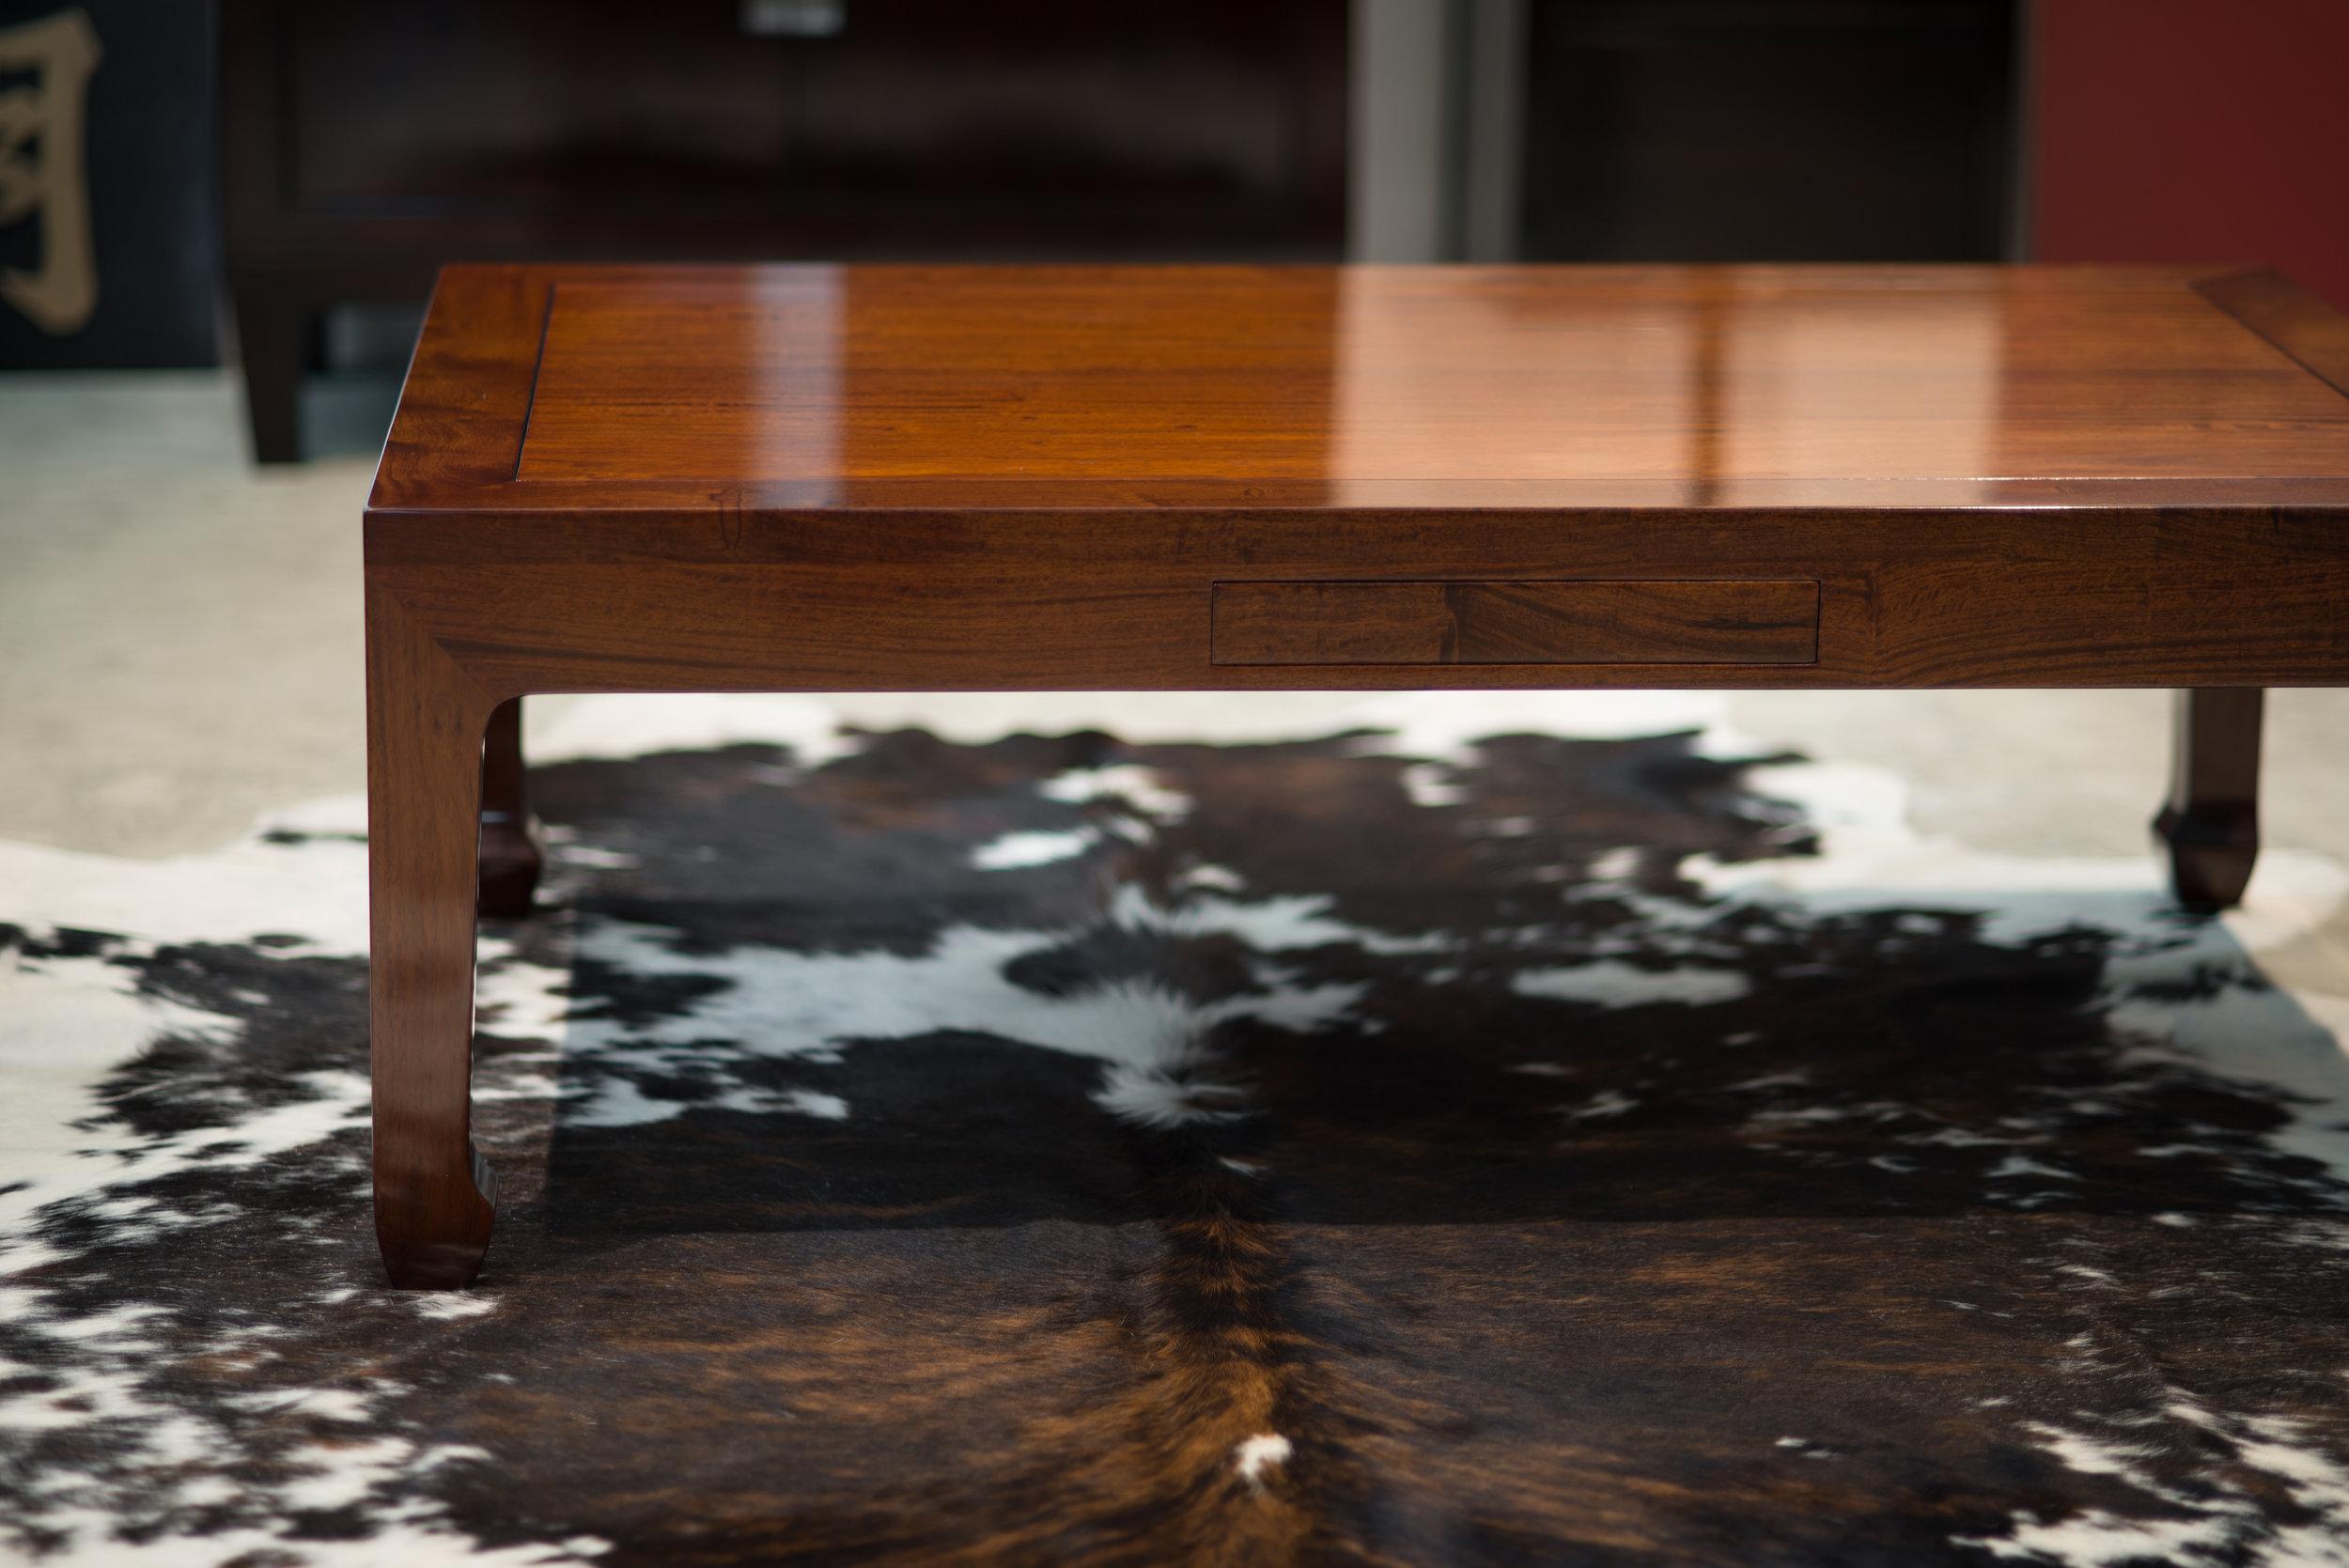 ....chinese ming style furniture | coffee table : lt 10..中式明式家具 | 咖啡台:lt 10....